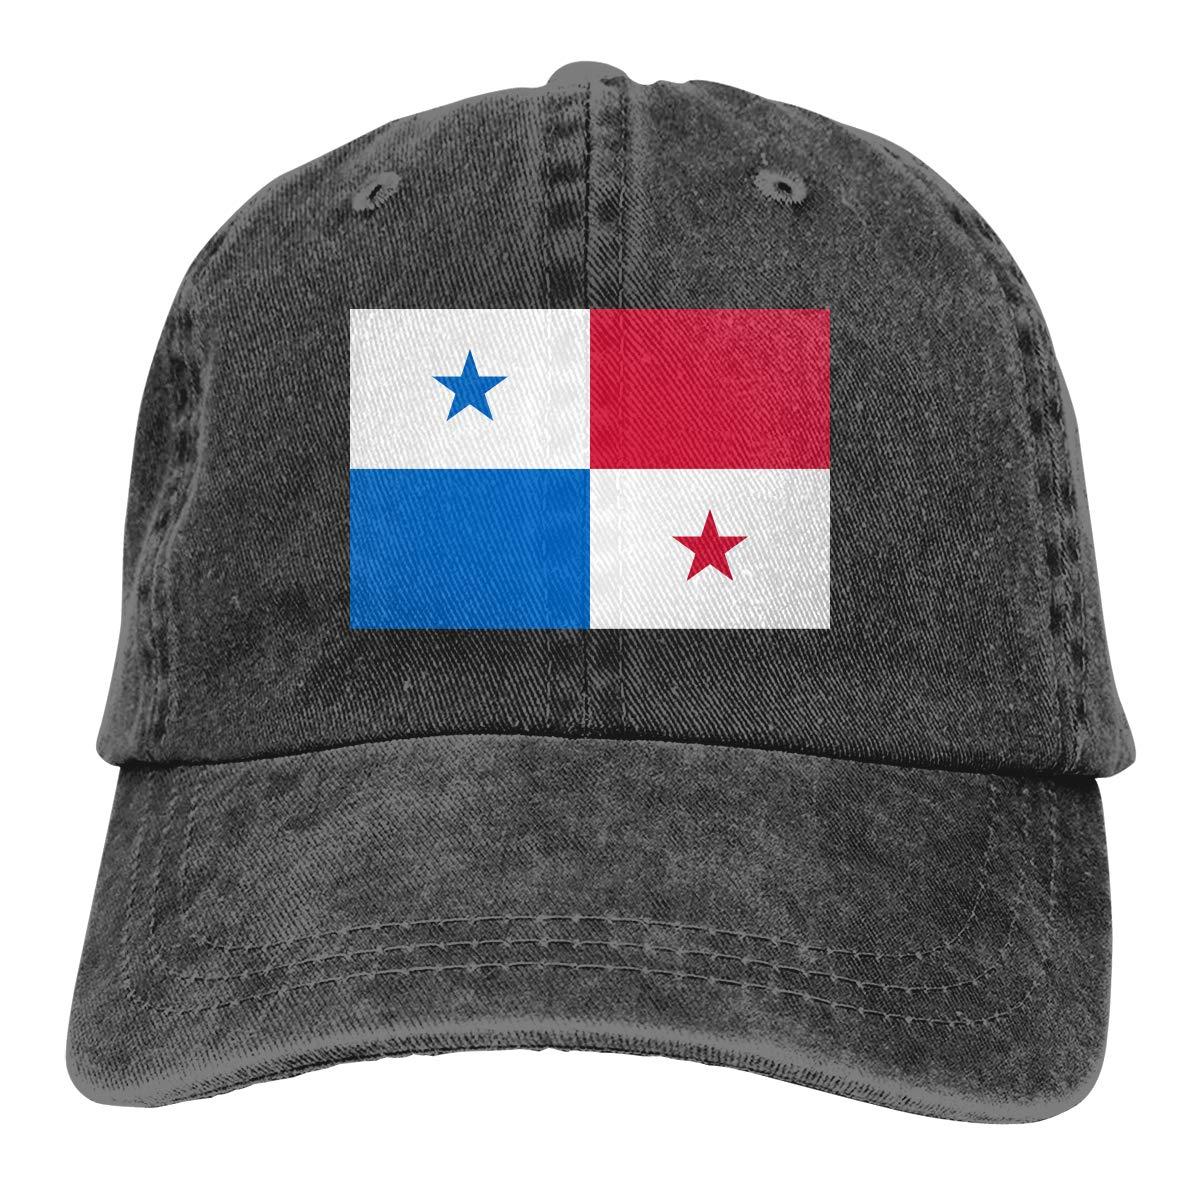 Amayc Adjustable Mens Denim Baseball Caps Flag of Panama Cool Cotton Hats